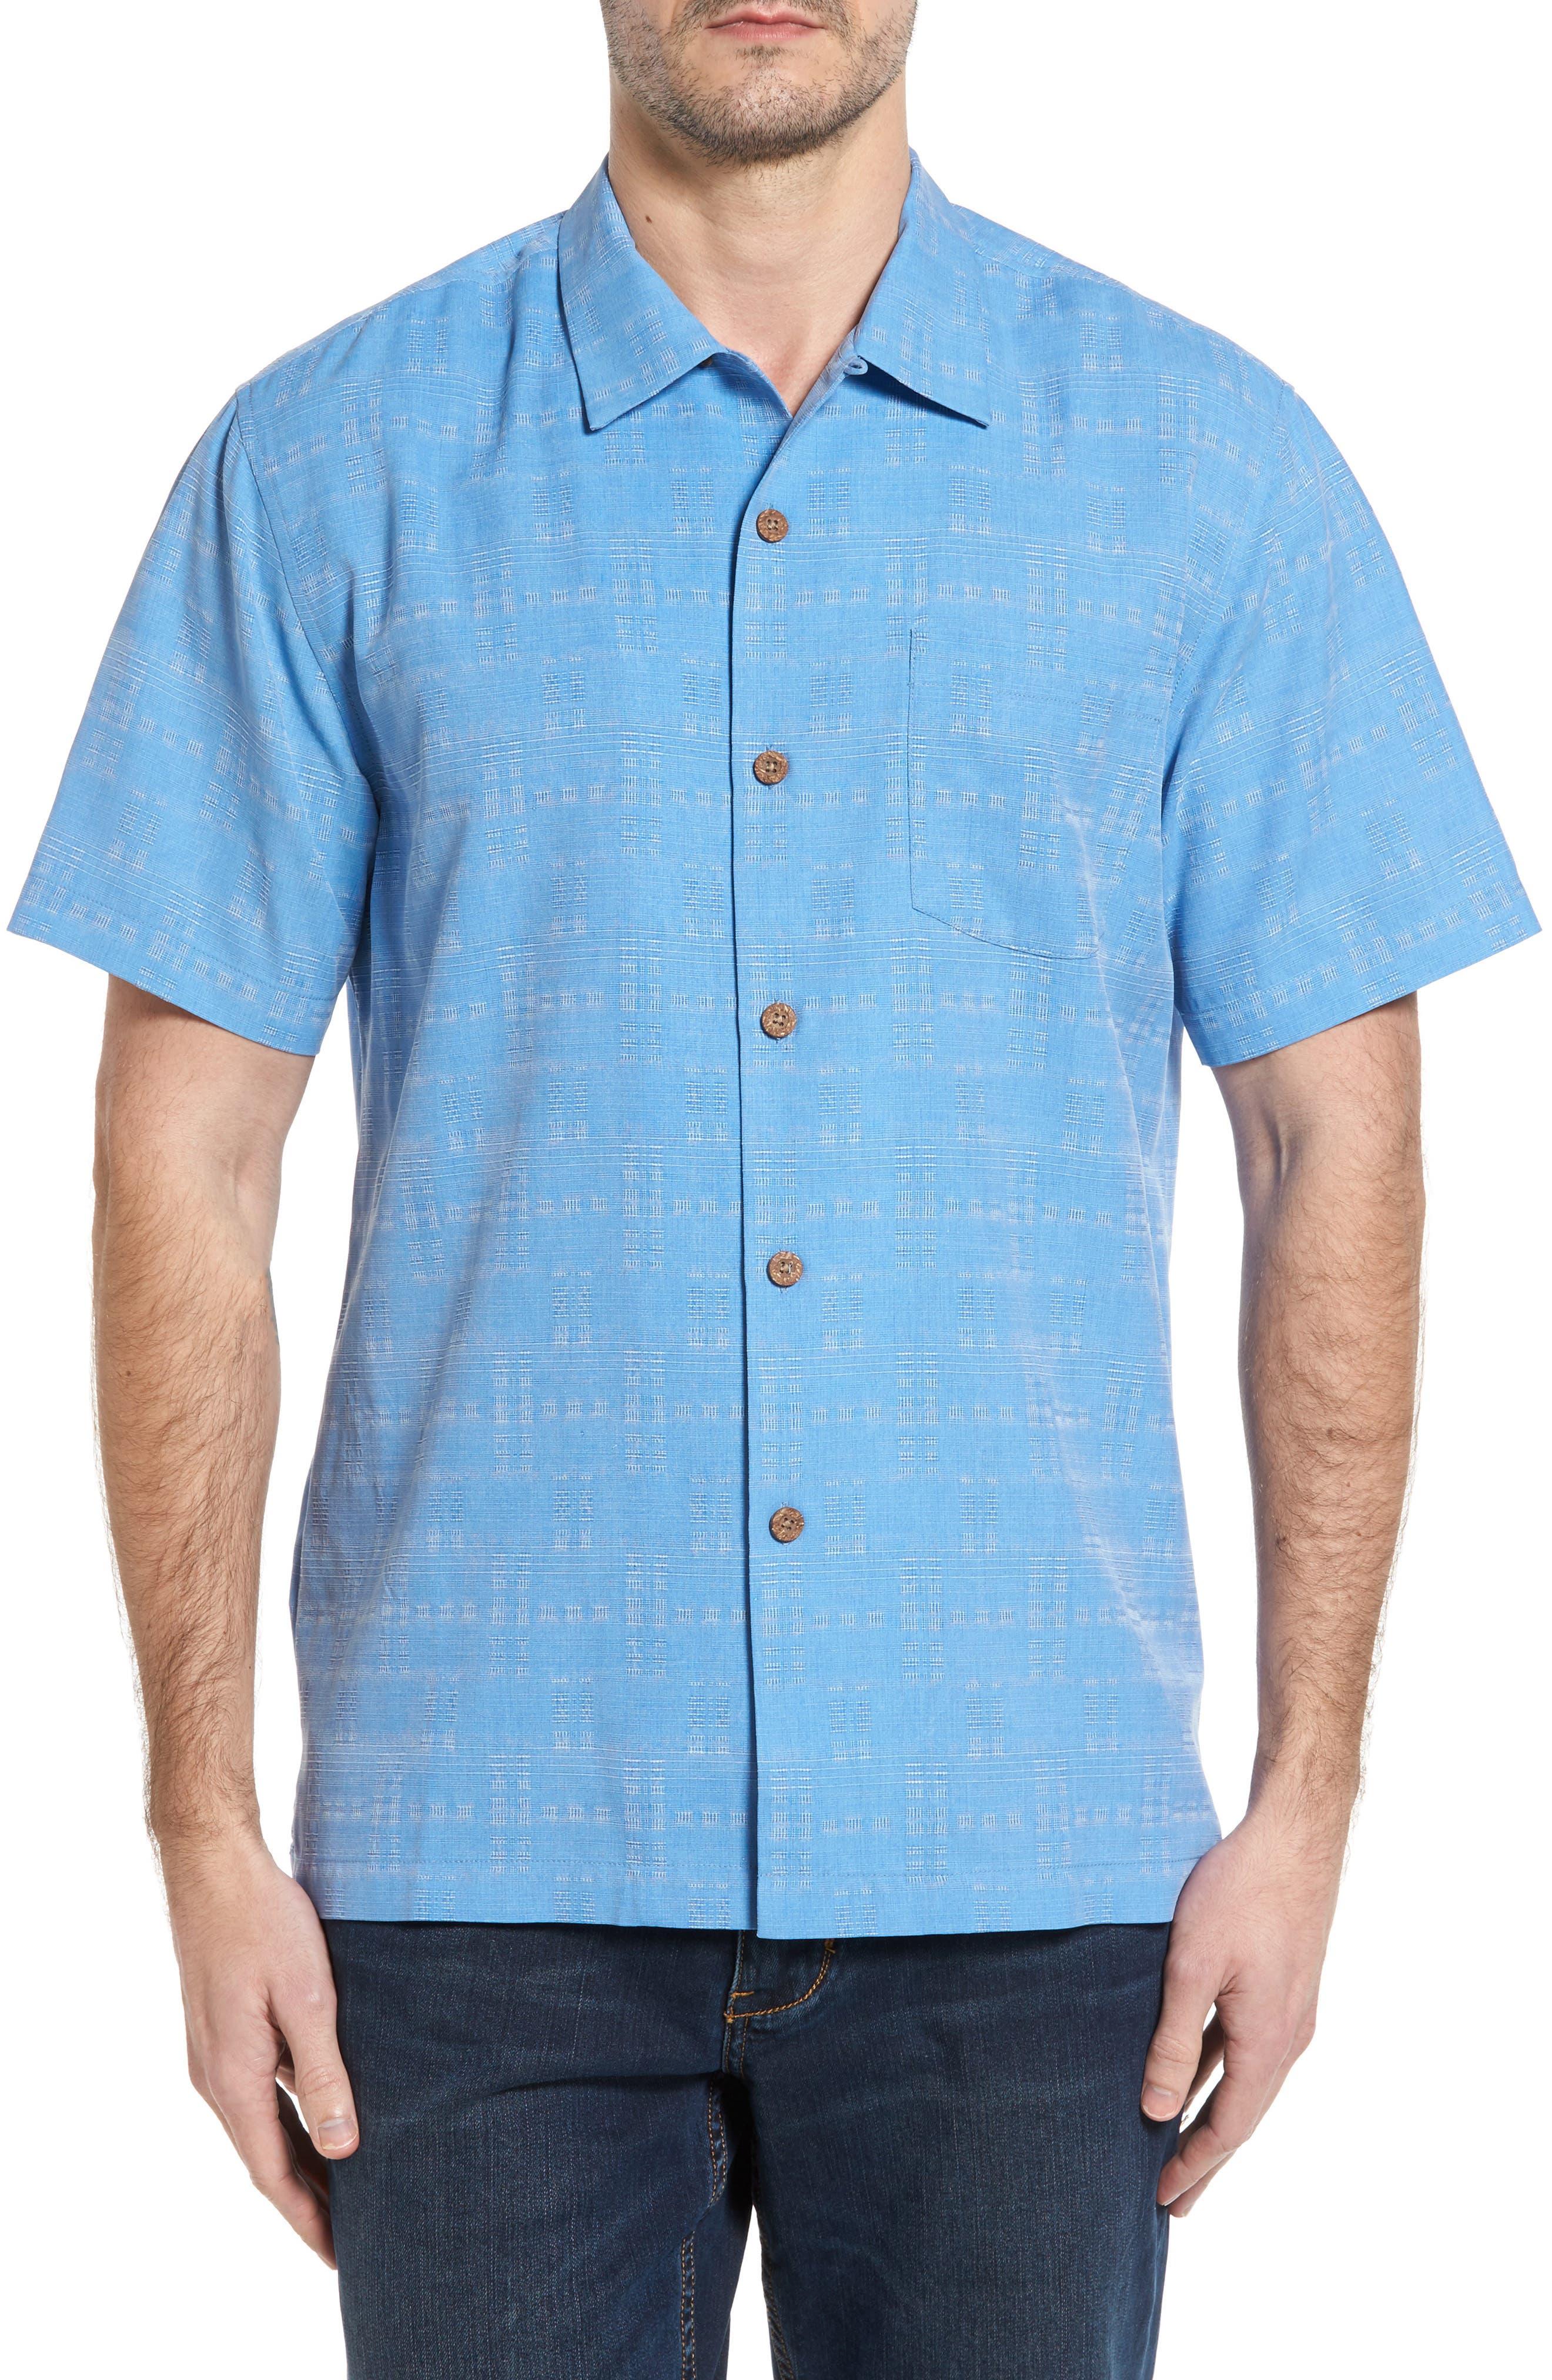 Alternate Image 1 Selected - Tommy Bahama Original Fit Jacquard Silk Camp Shirt